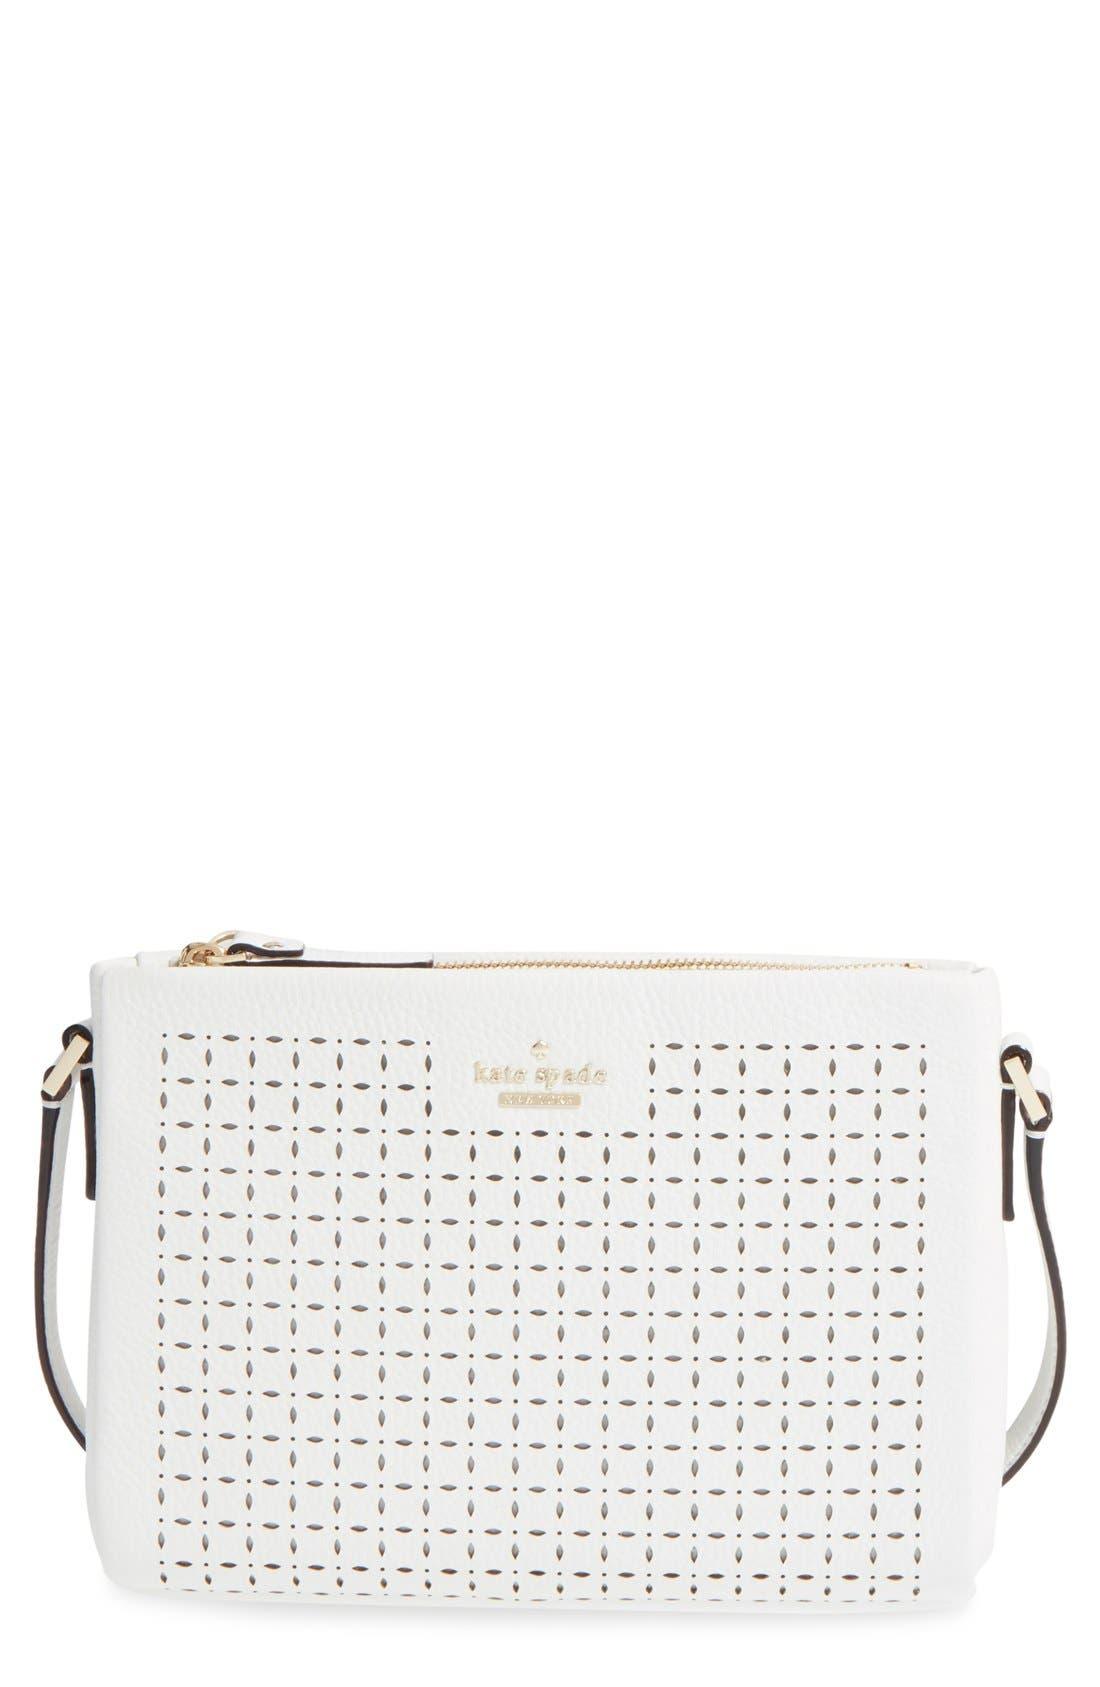 KATE SPADE NEW YORK 'milton lane - lilibeth' perforated leather crossbody bag, Main, color, 100